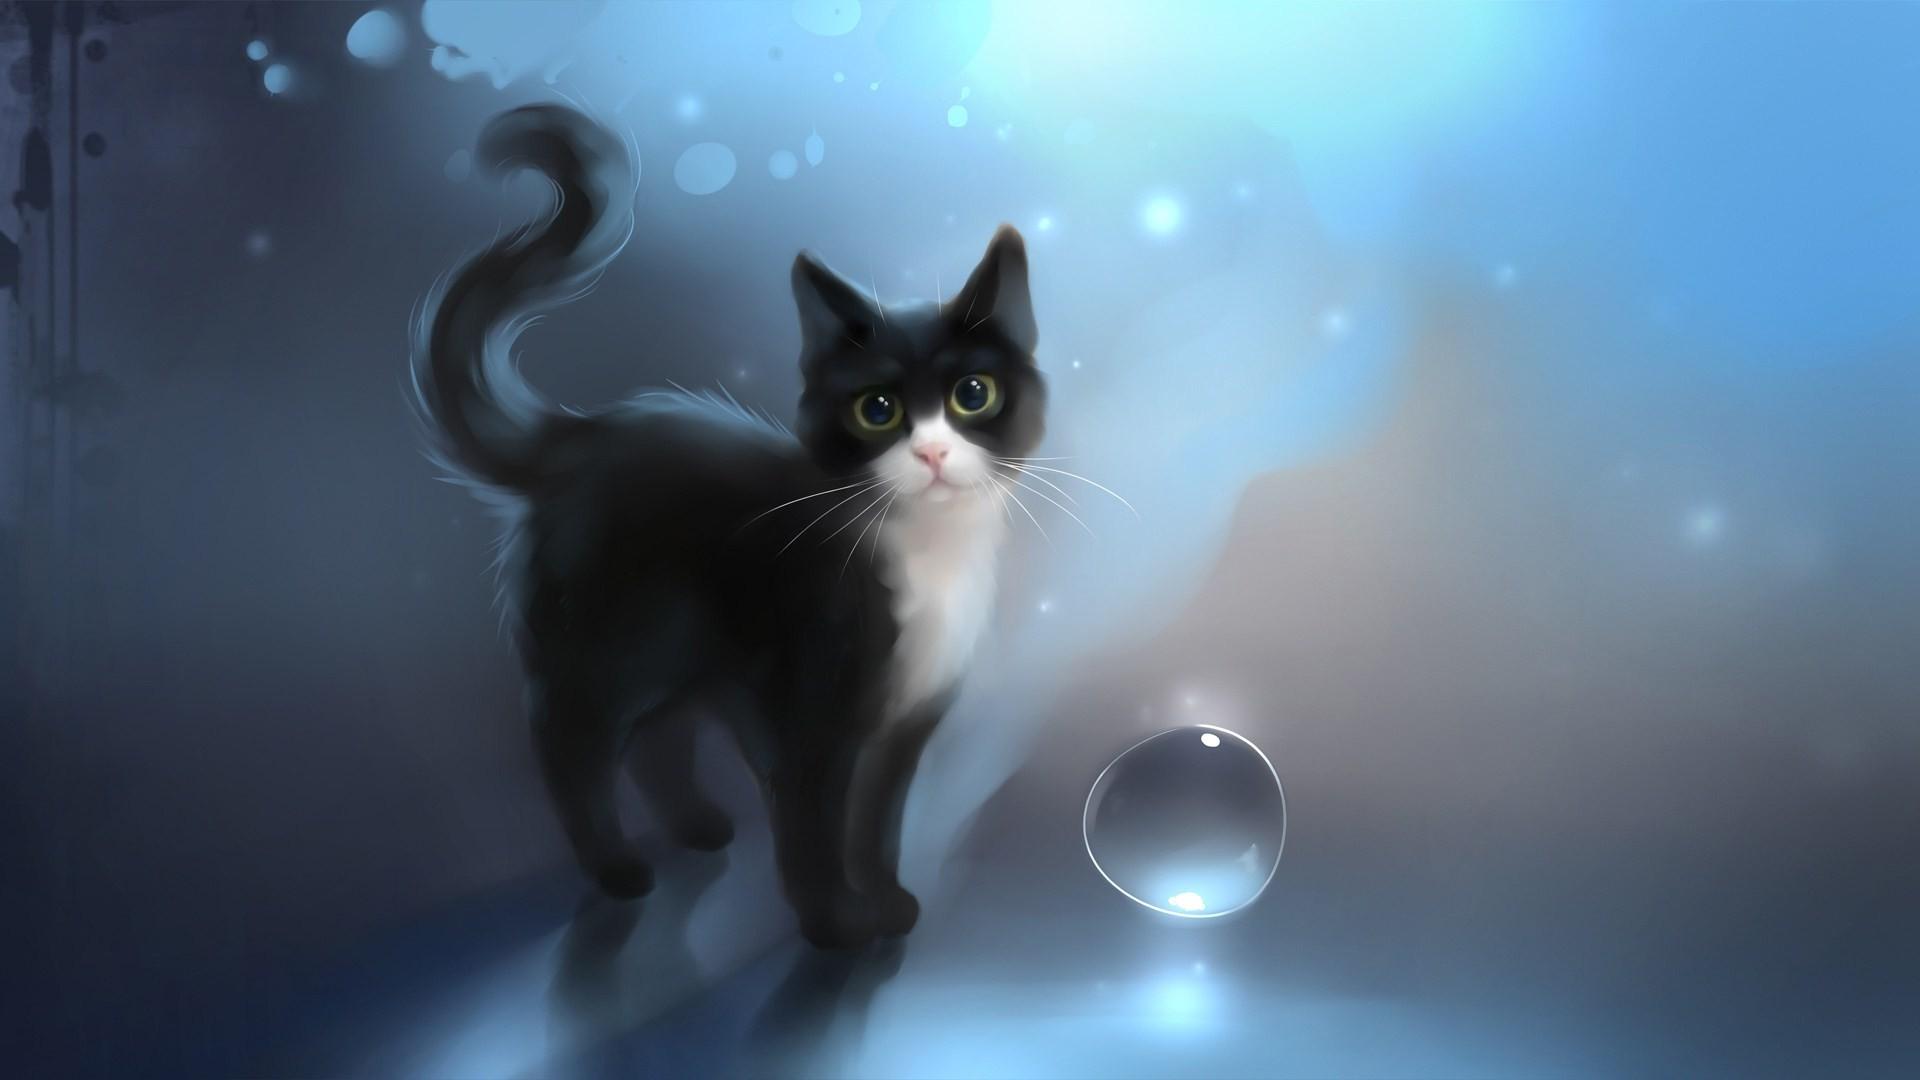 Wiki Download Free Anime Cat Wallpaper Pic   Data Src - Anime Cat Background - HD Wallpaper